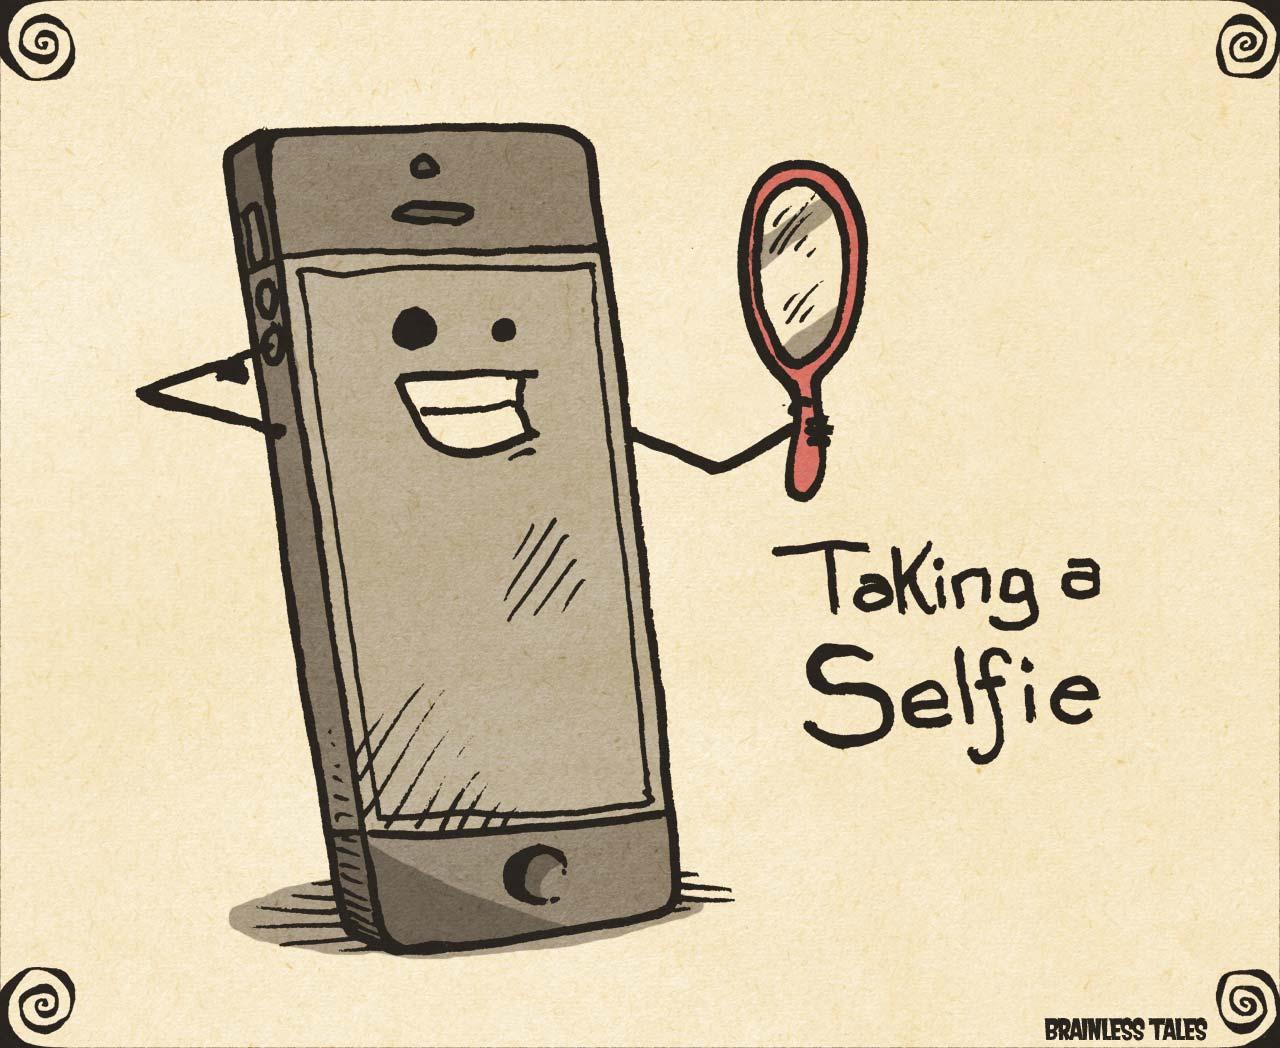 Promotional Selfie